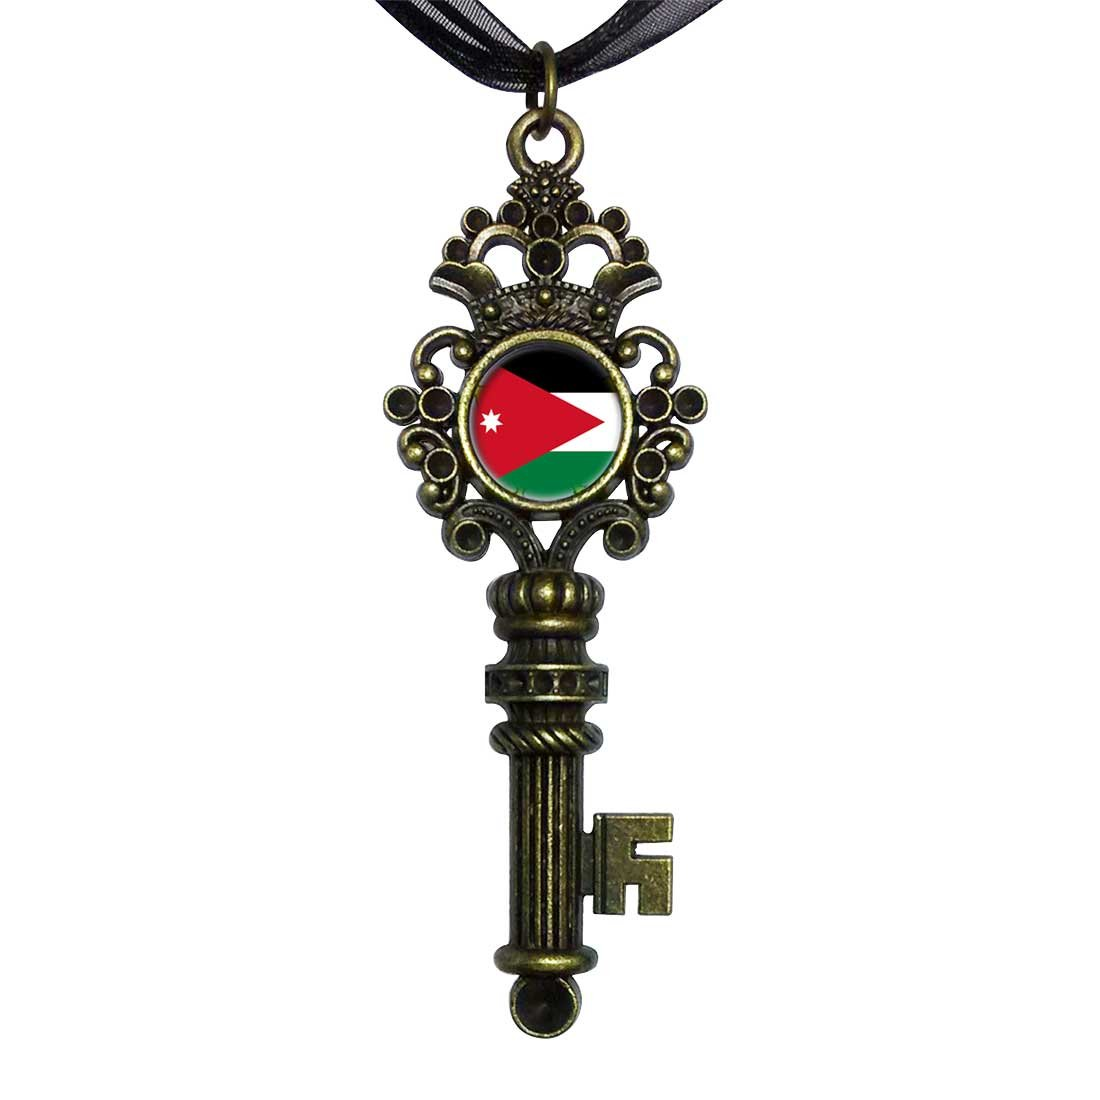 GiftJewelryShop Bronze Retro Style Jordan flag Vintage Keys Charm Pendant Necklace